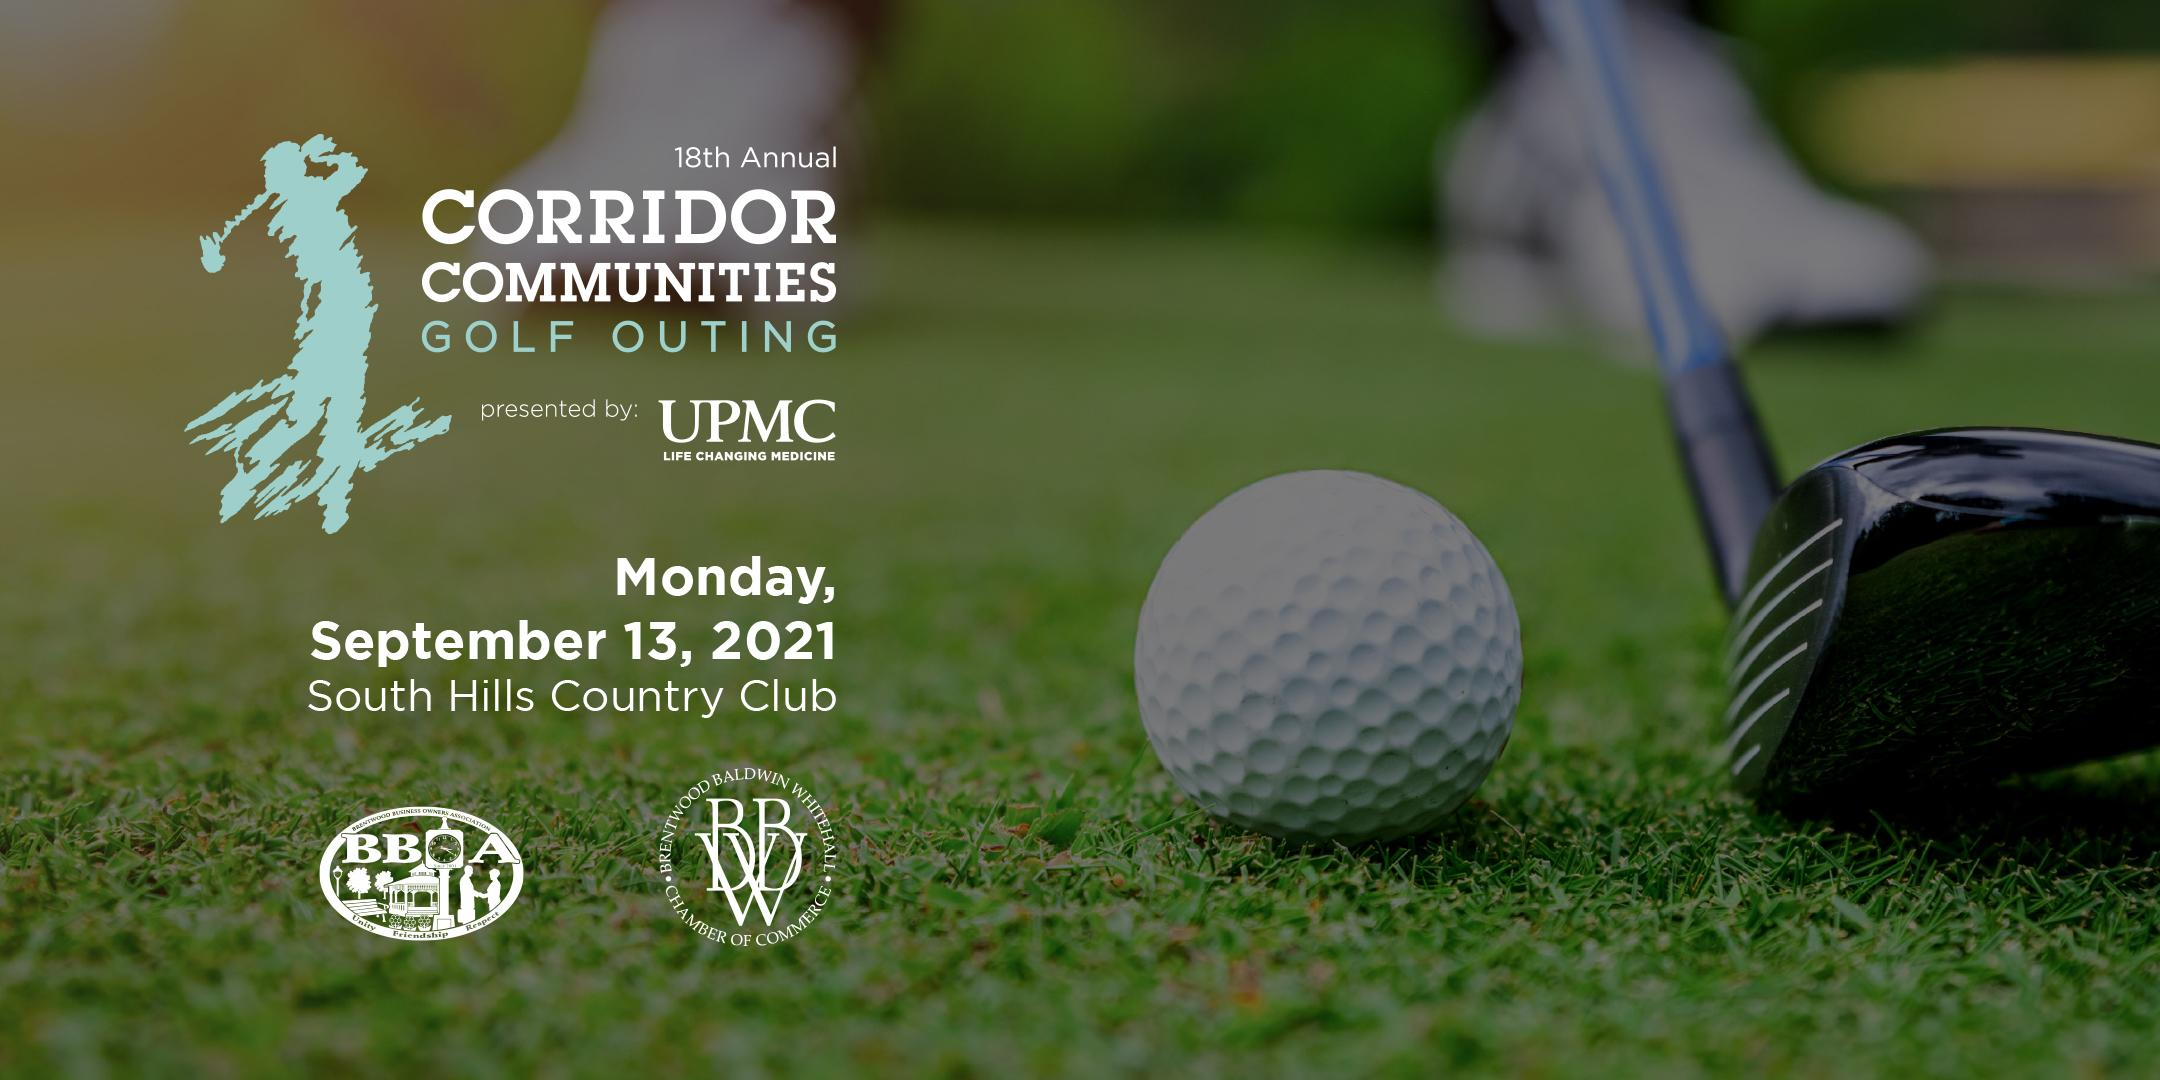 18th Annual Corridor Communities Golf Outing